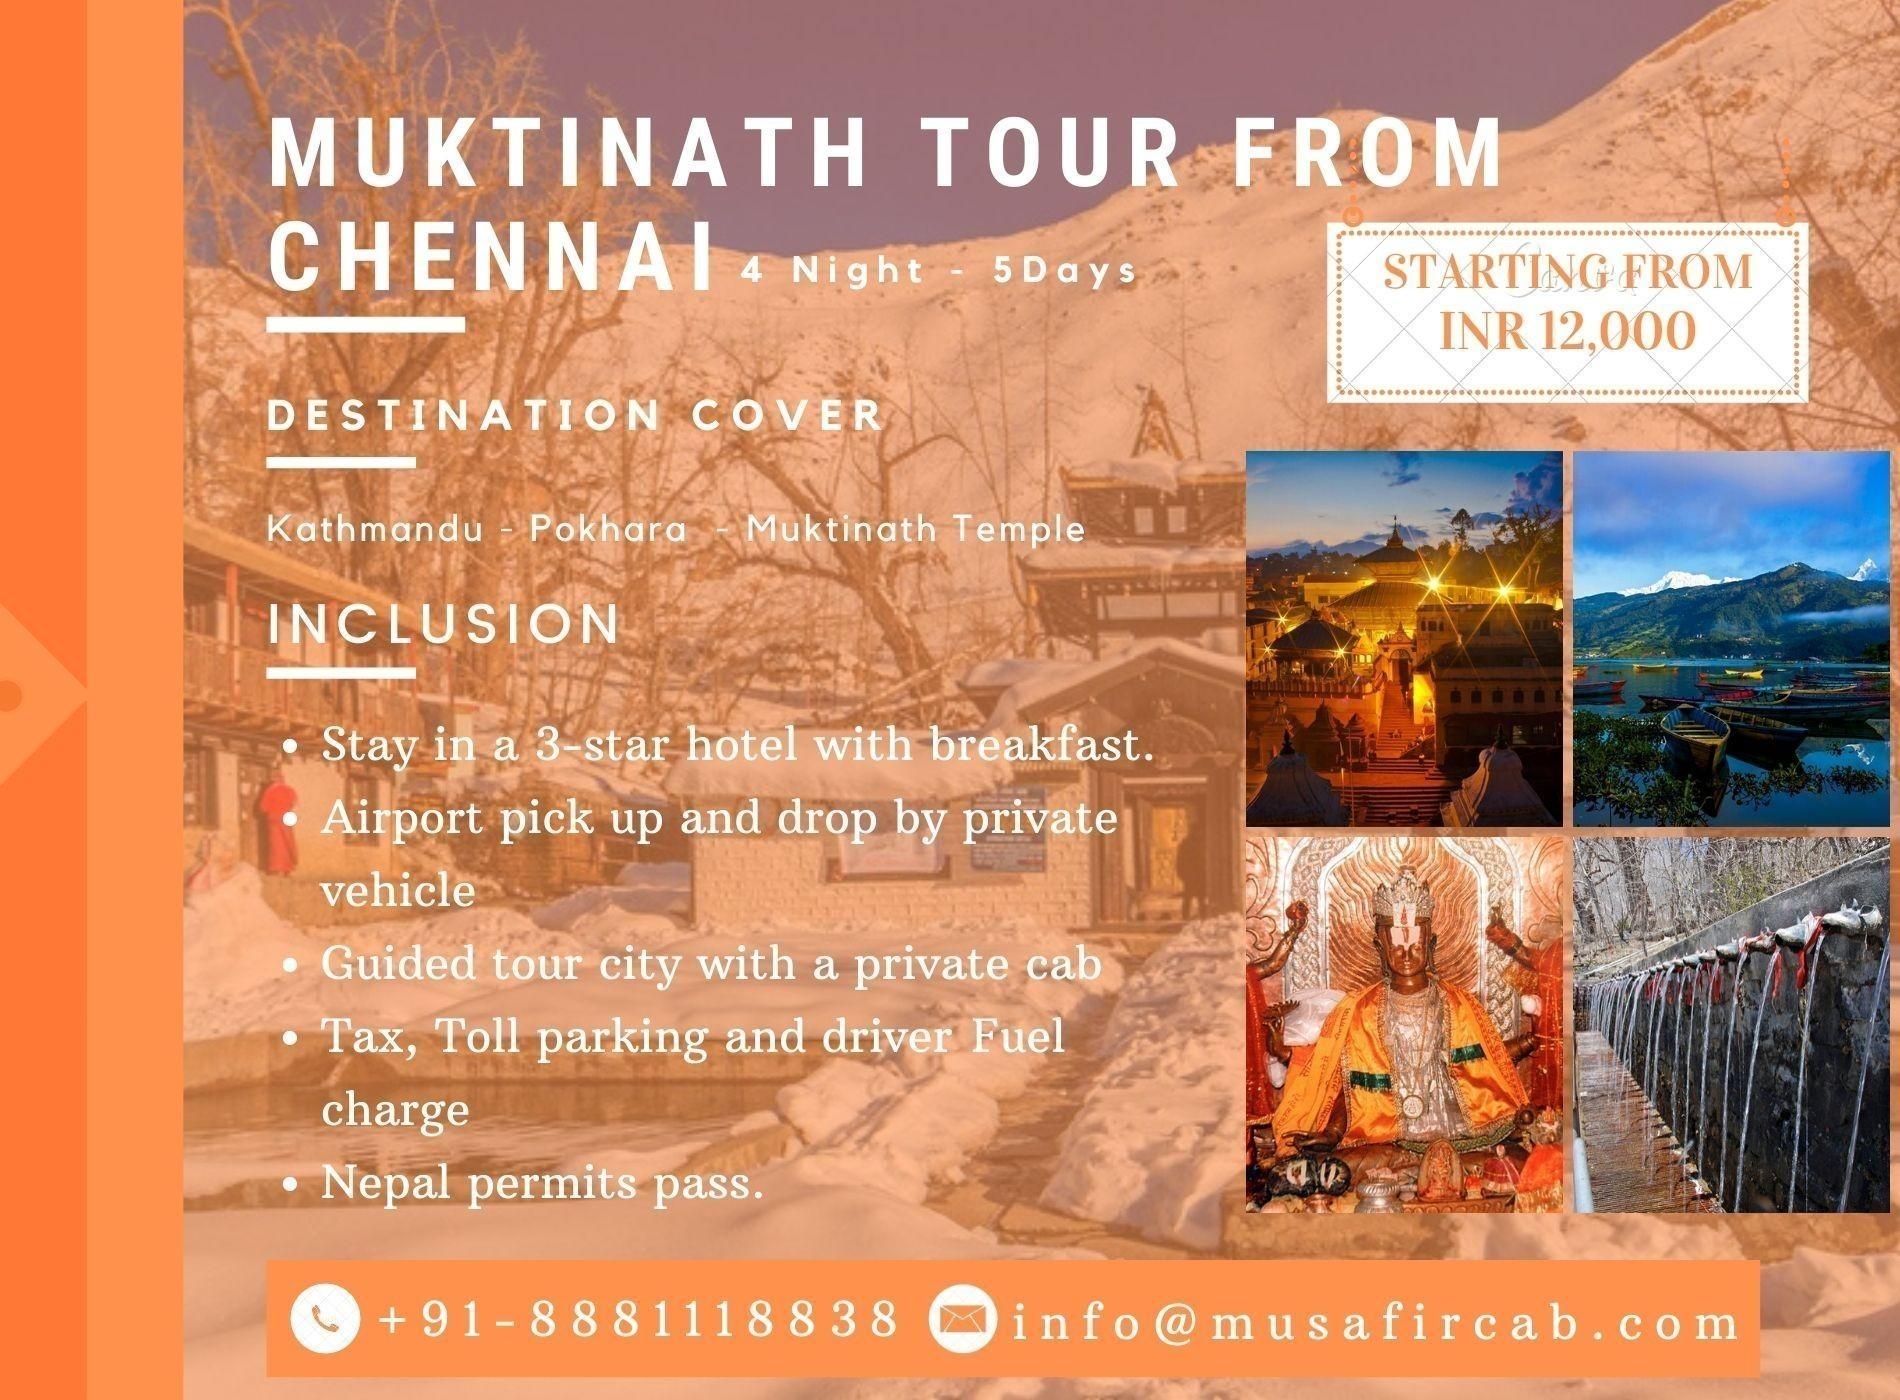 Muktinath Tour from Chennai